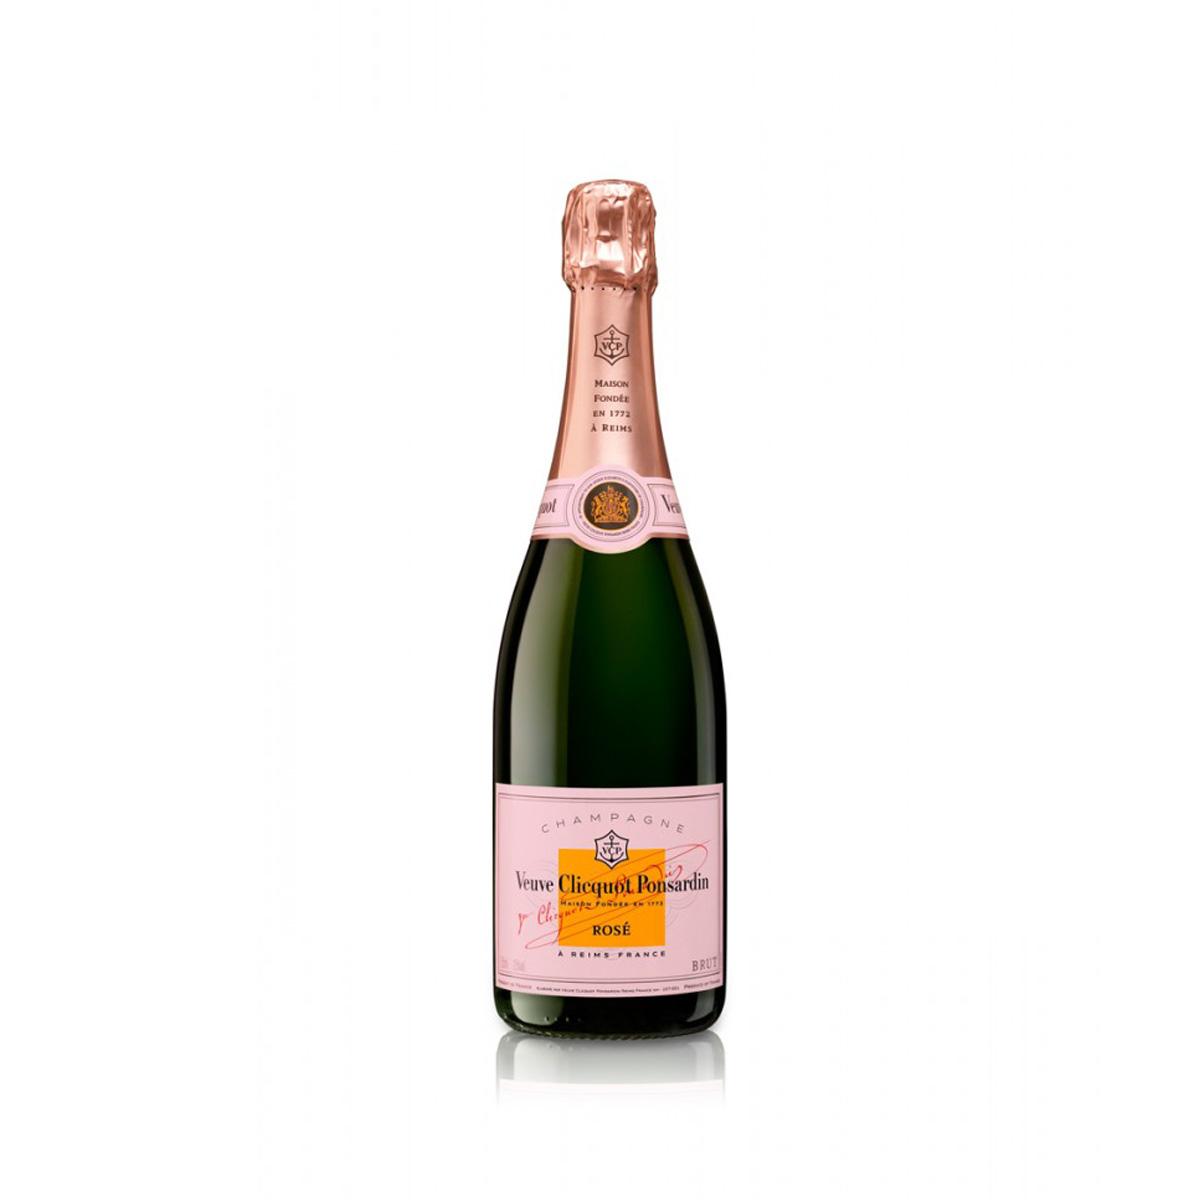 Szampan Veuve Clicquot Brut Rosé 0,75 l